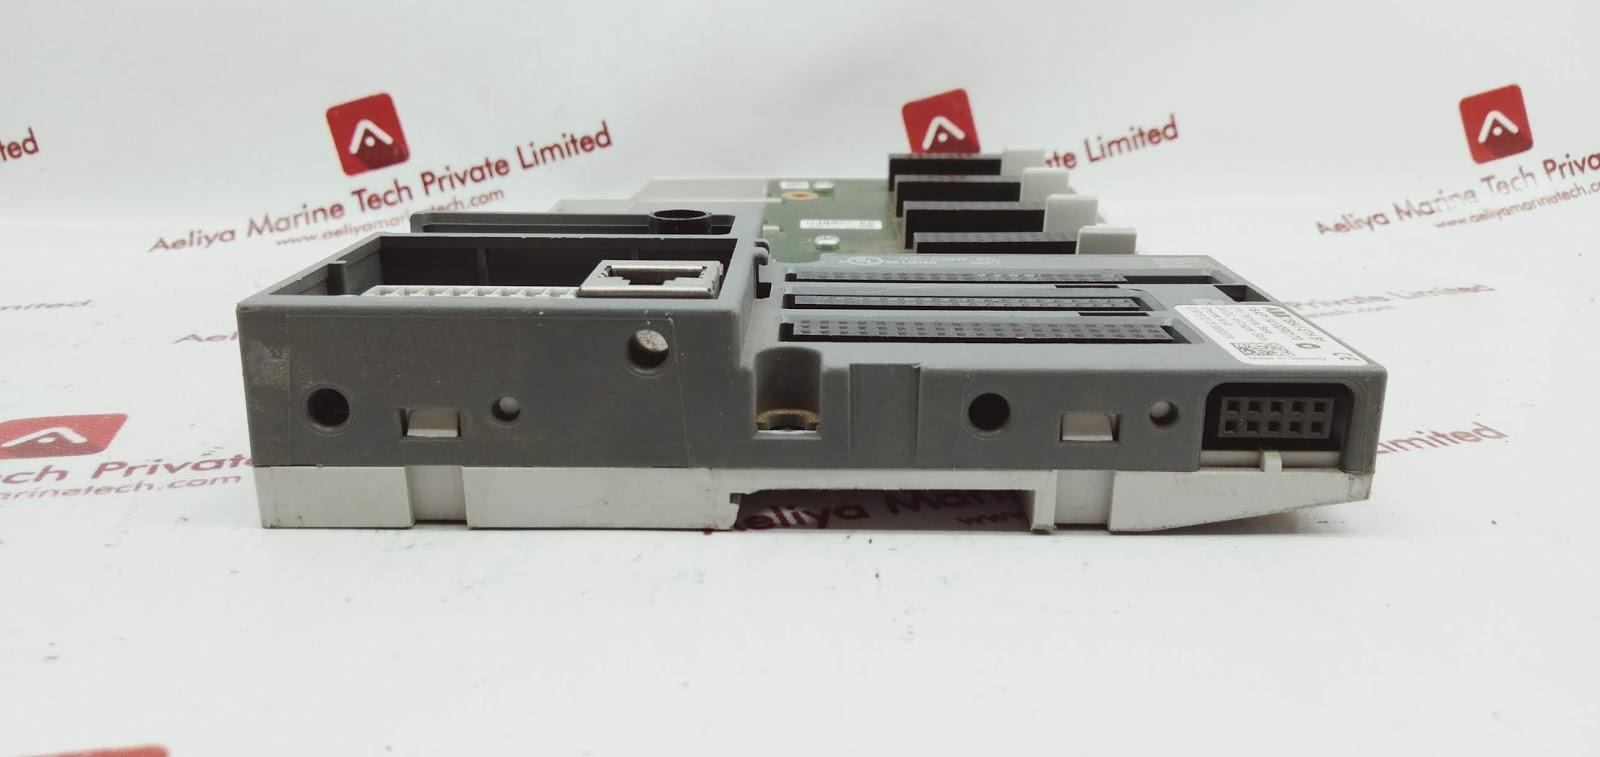 ABB TB541-ETH B1 1SAP 114100R0170 CPU TERMINAL BASE 24VDC | AELIYA